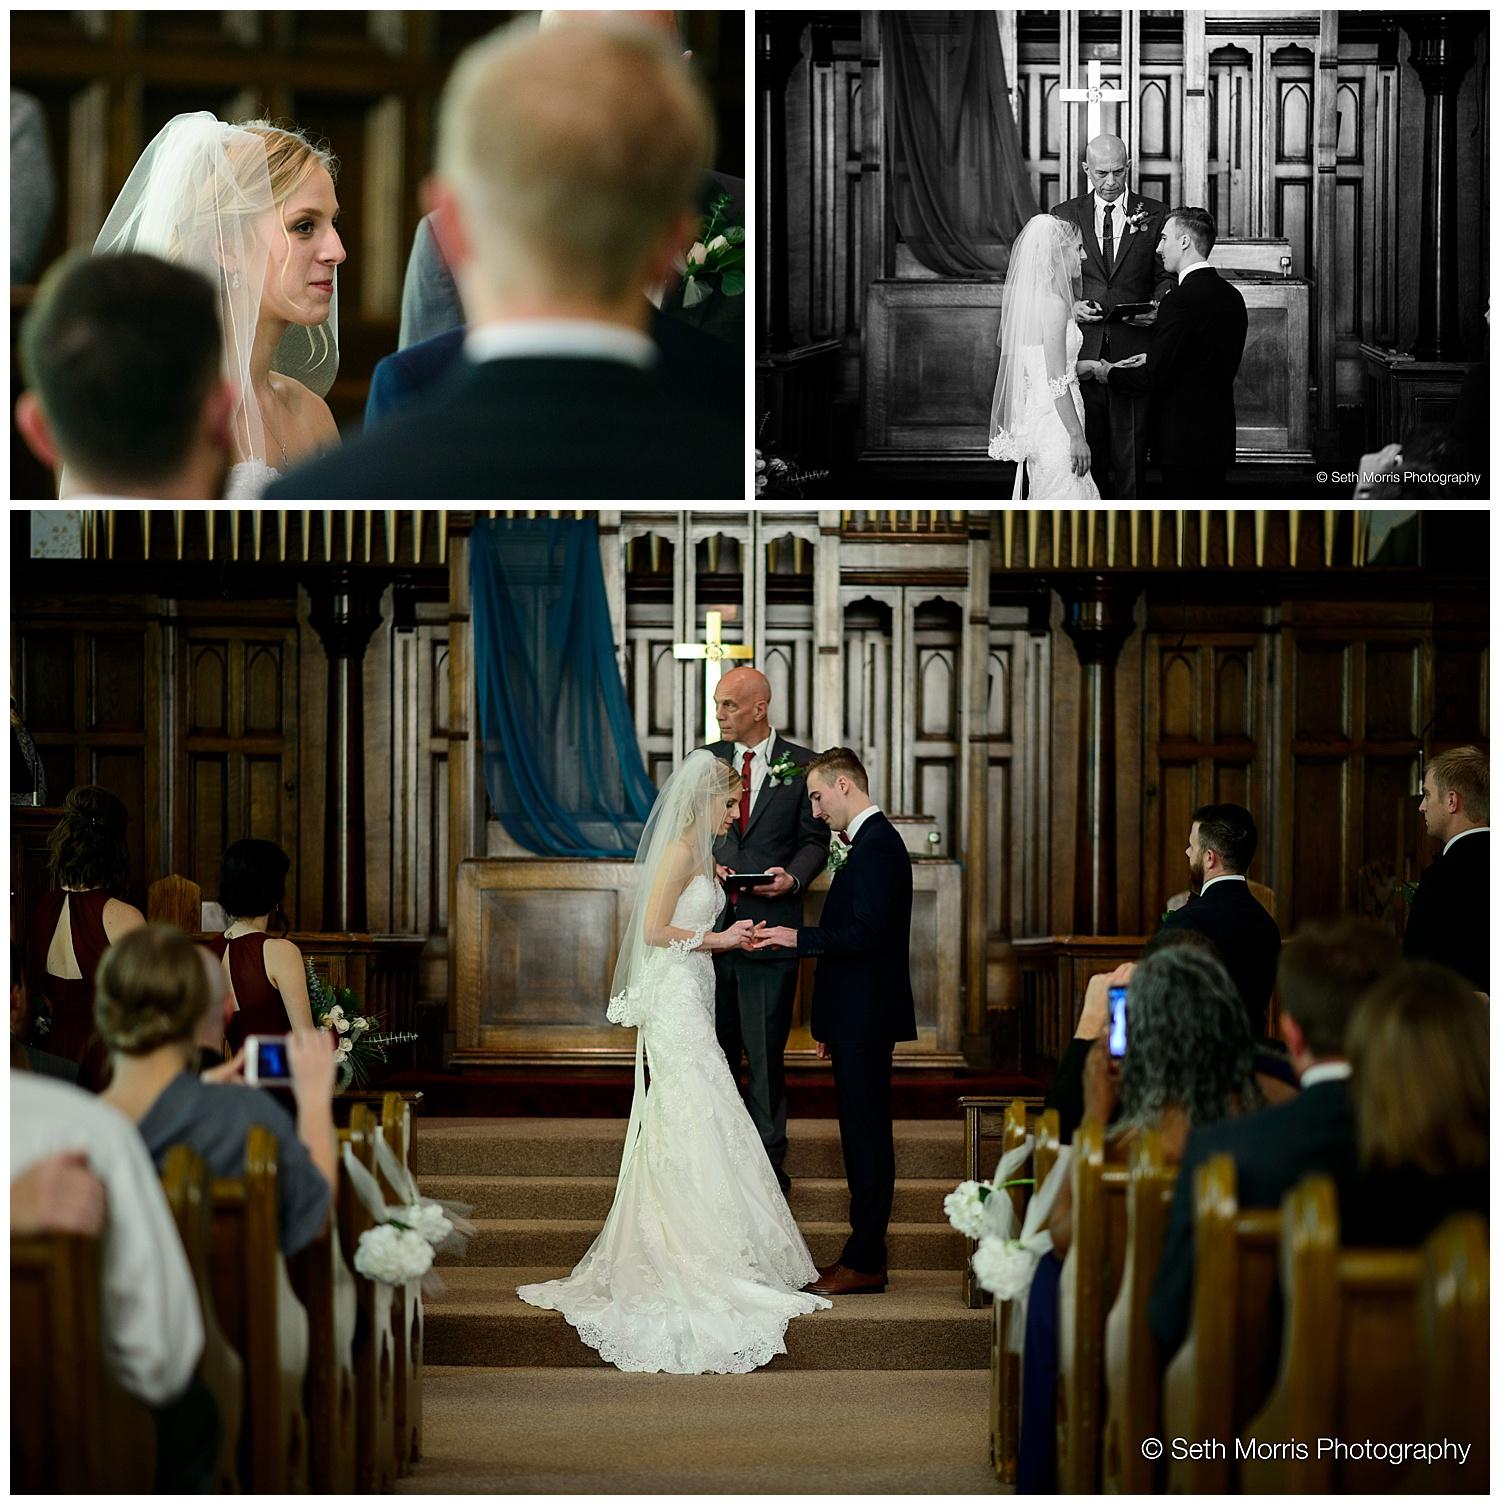 fall-wedding-ottawa-illinois-photographer-36.jpg